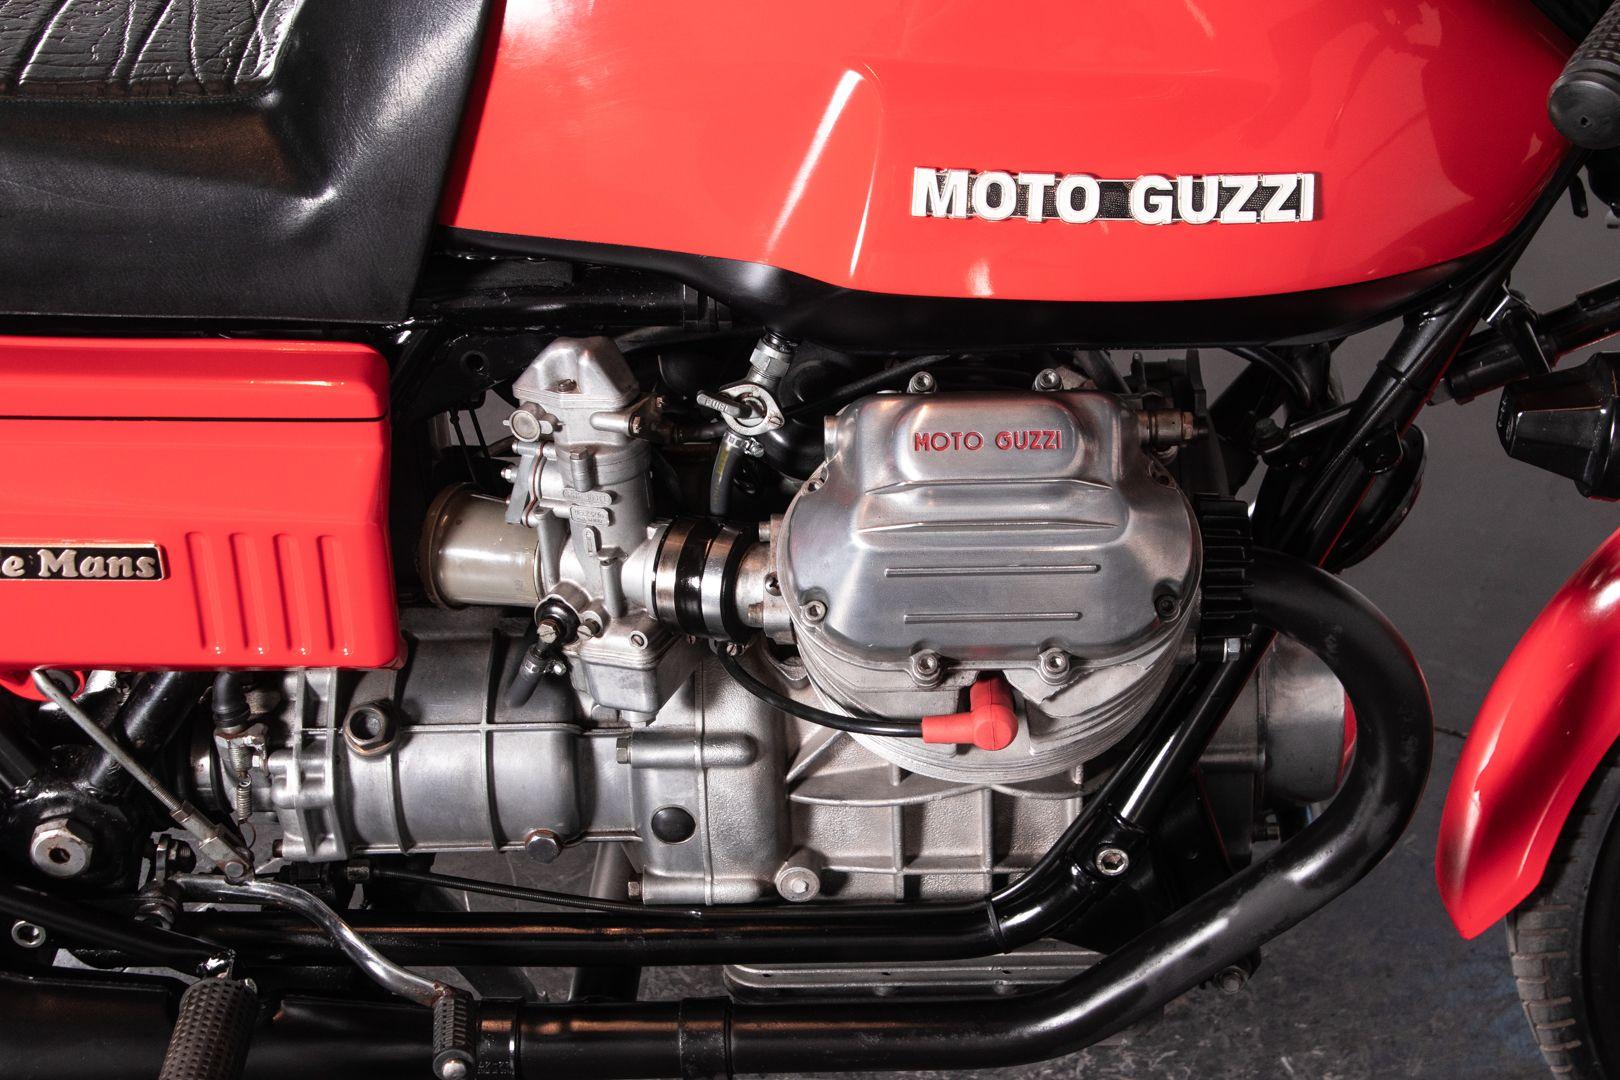 1978 MOTO GUZZI 850 LE MANS 48665